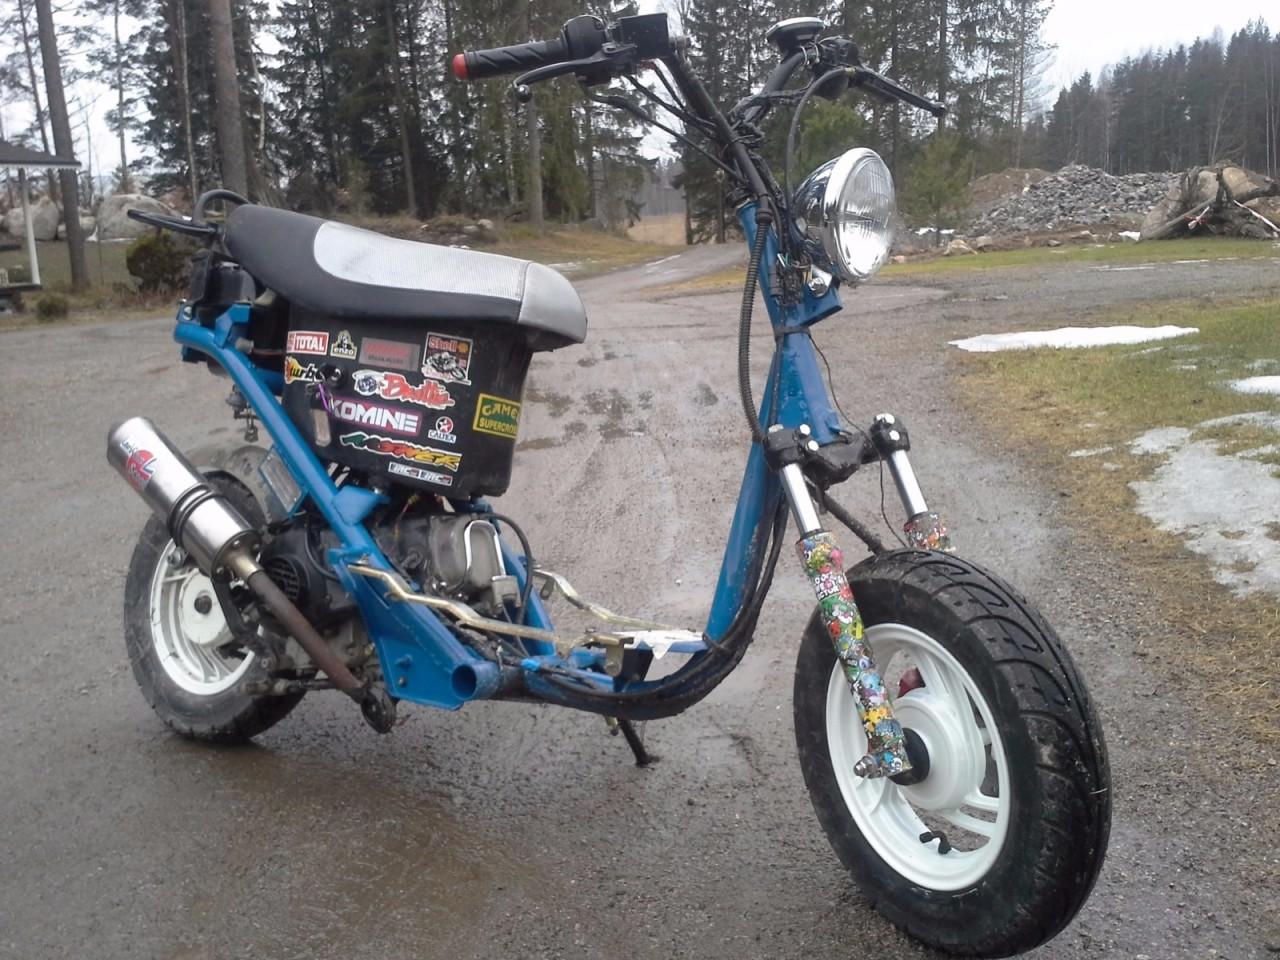 Kuva: Fude 80 Tuning GY6 Scooter (Fude Sport 50)